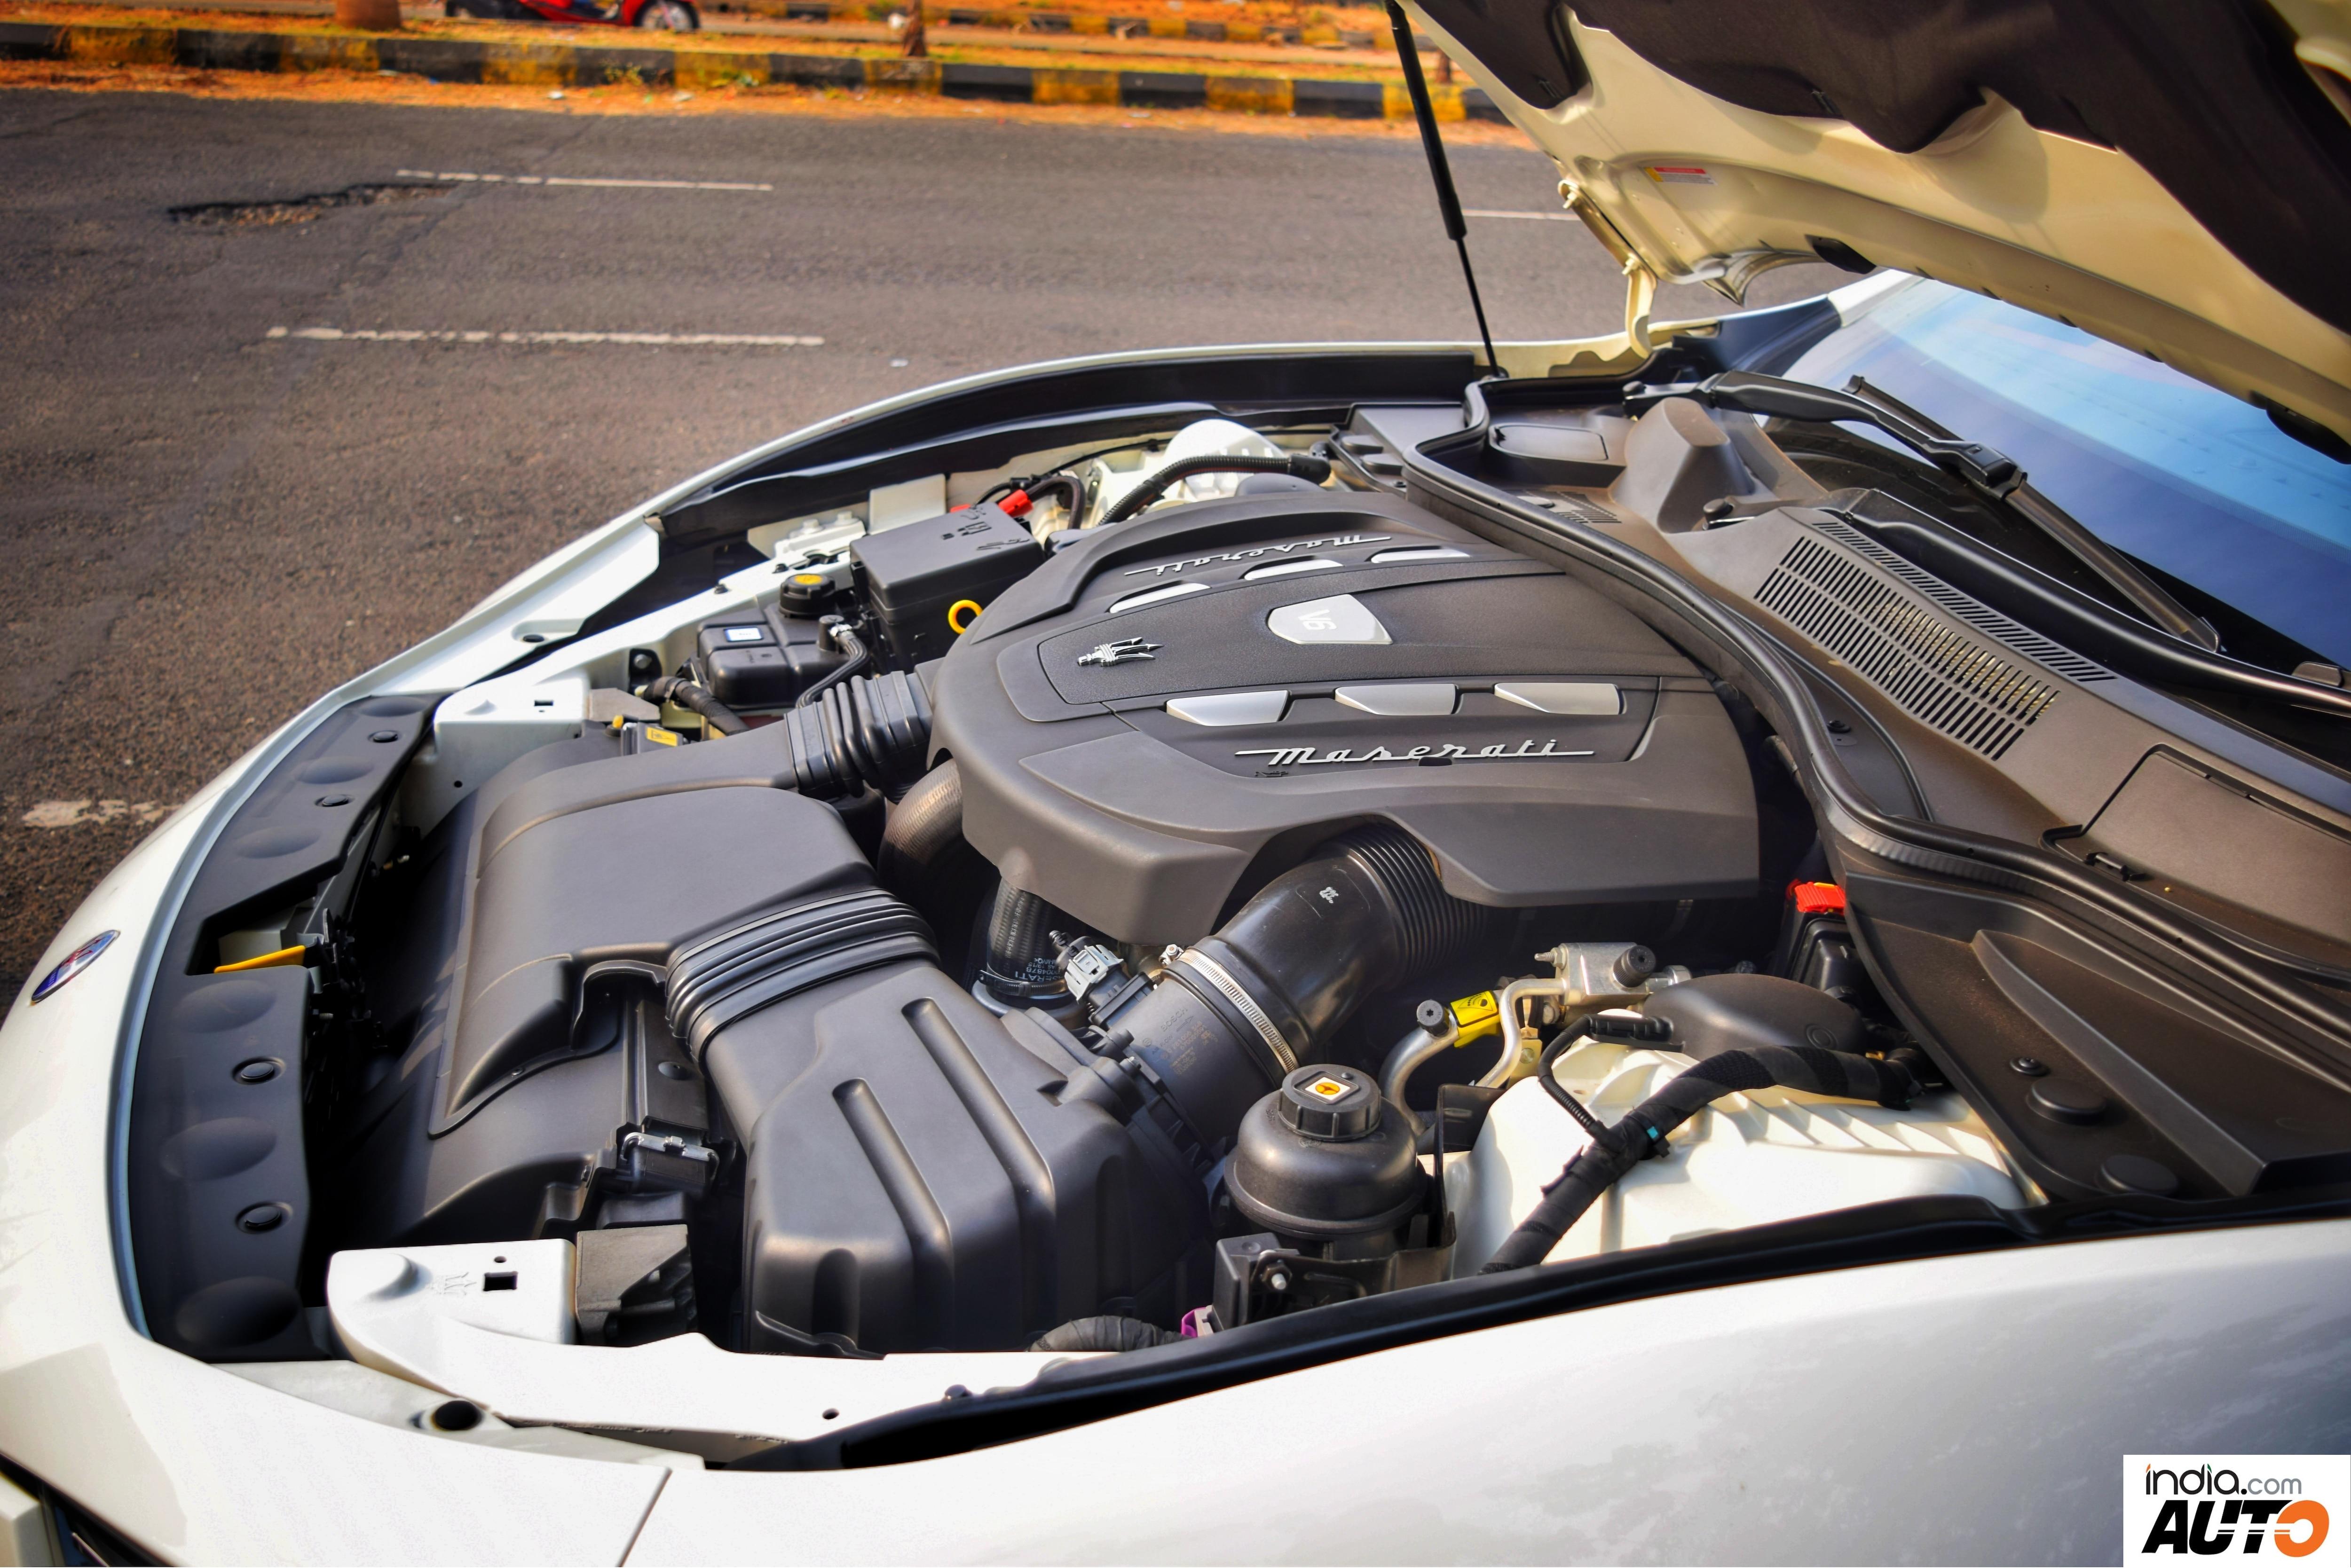 Maserati Ghibli 3.0L V6 Diesel Engine